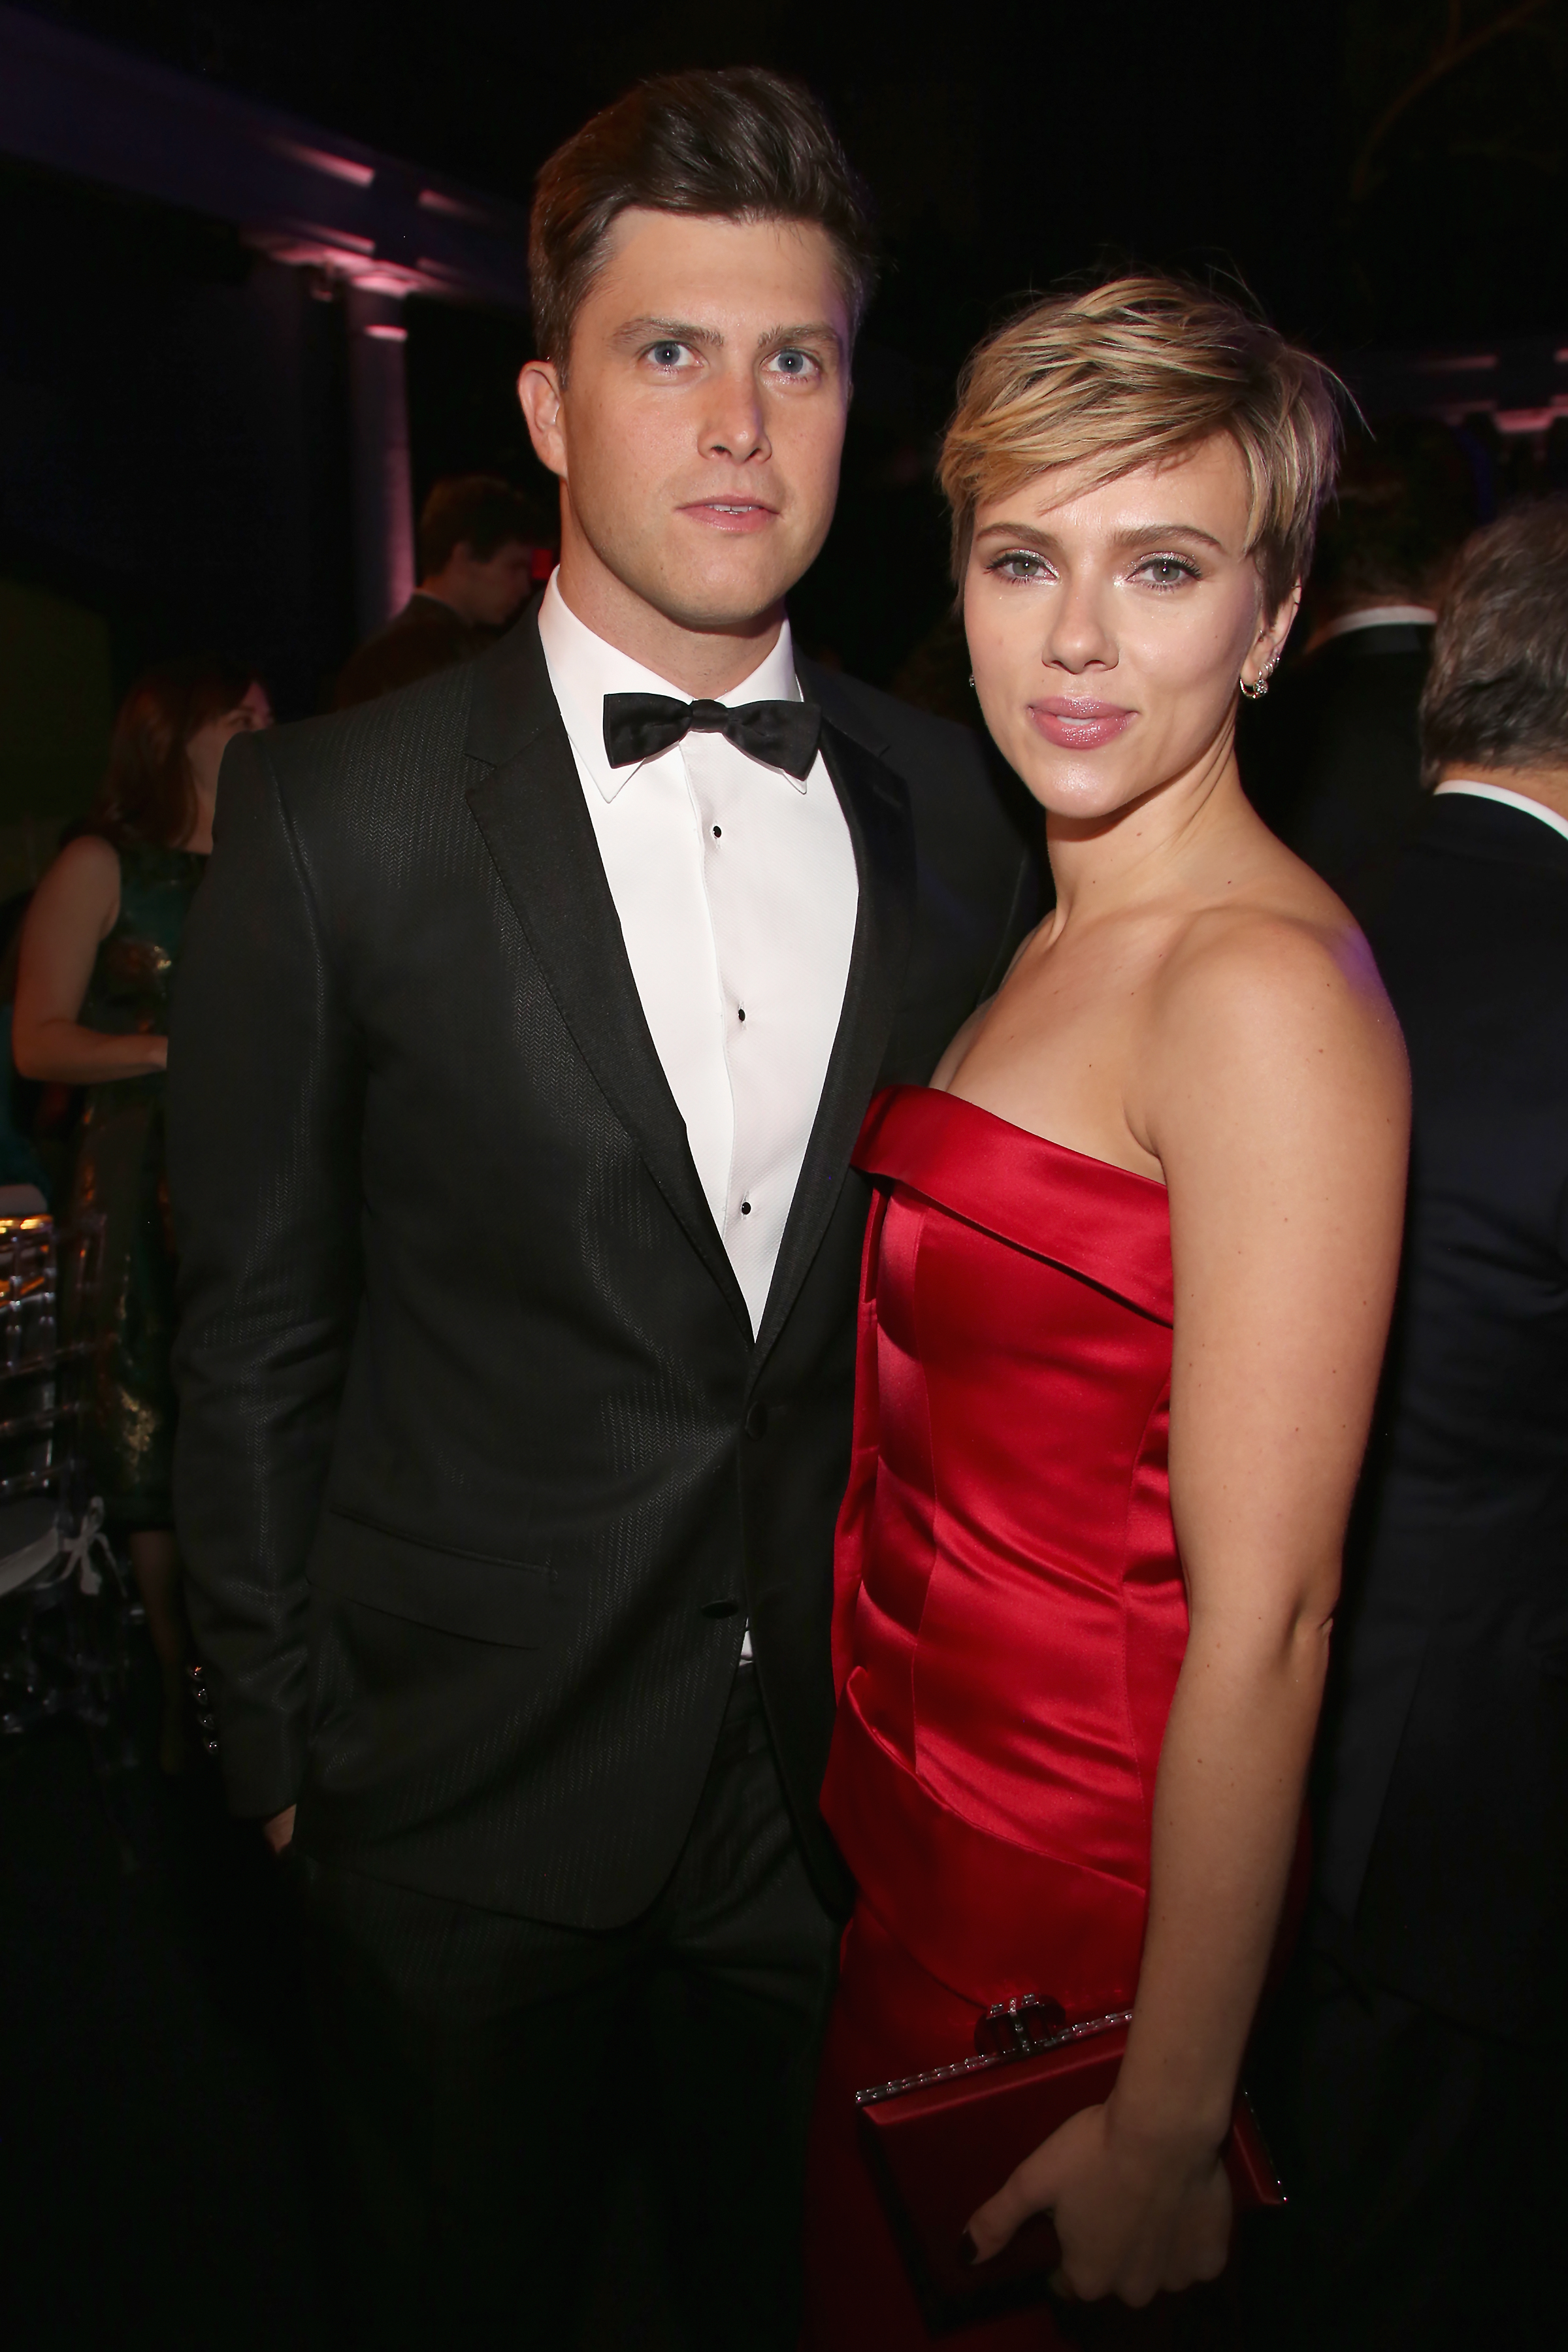 Scarlett-Johansson-SNL-Boyfriend-Colin-Jost-Make-Their-First-Public-Appearance-Together